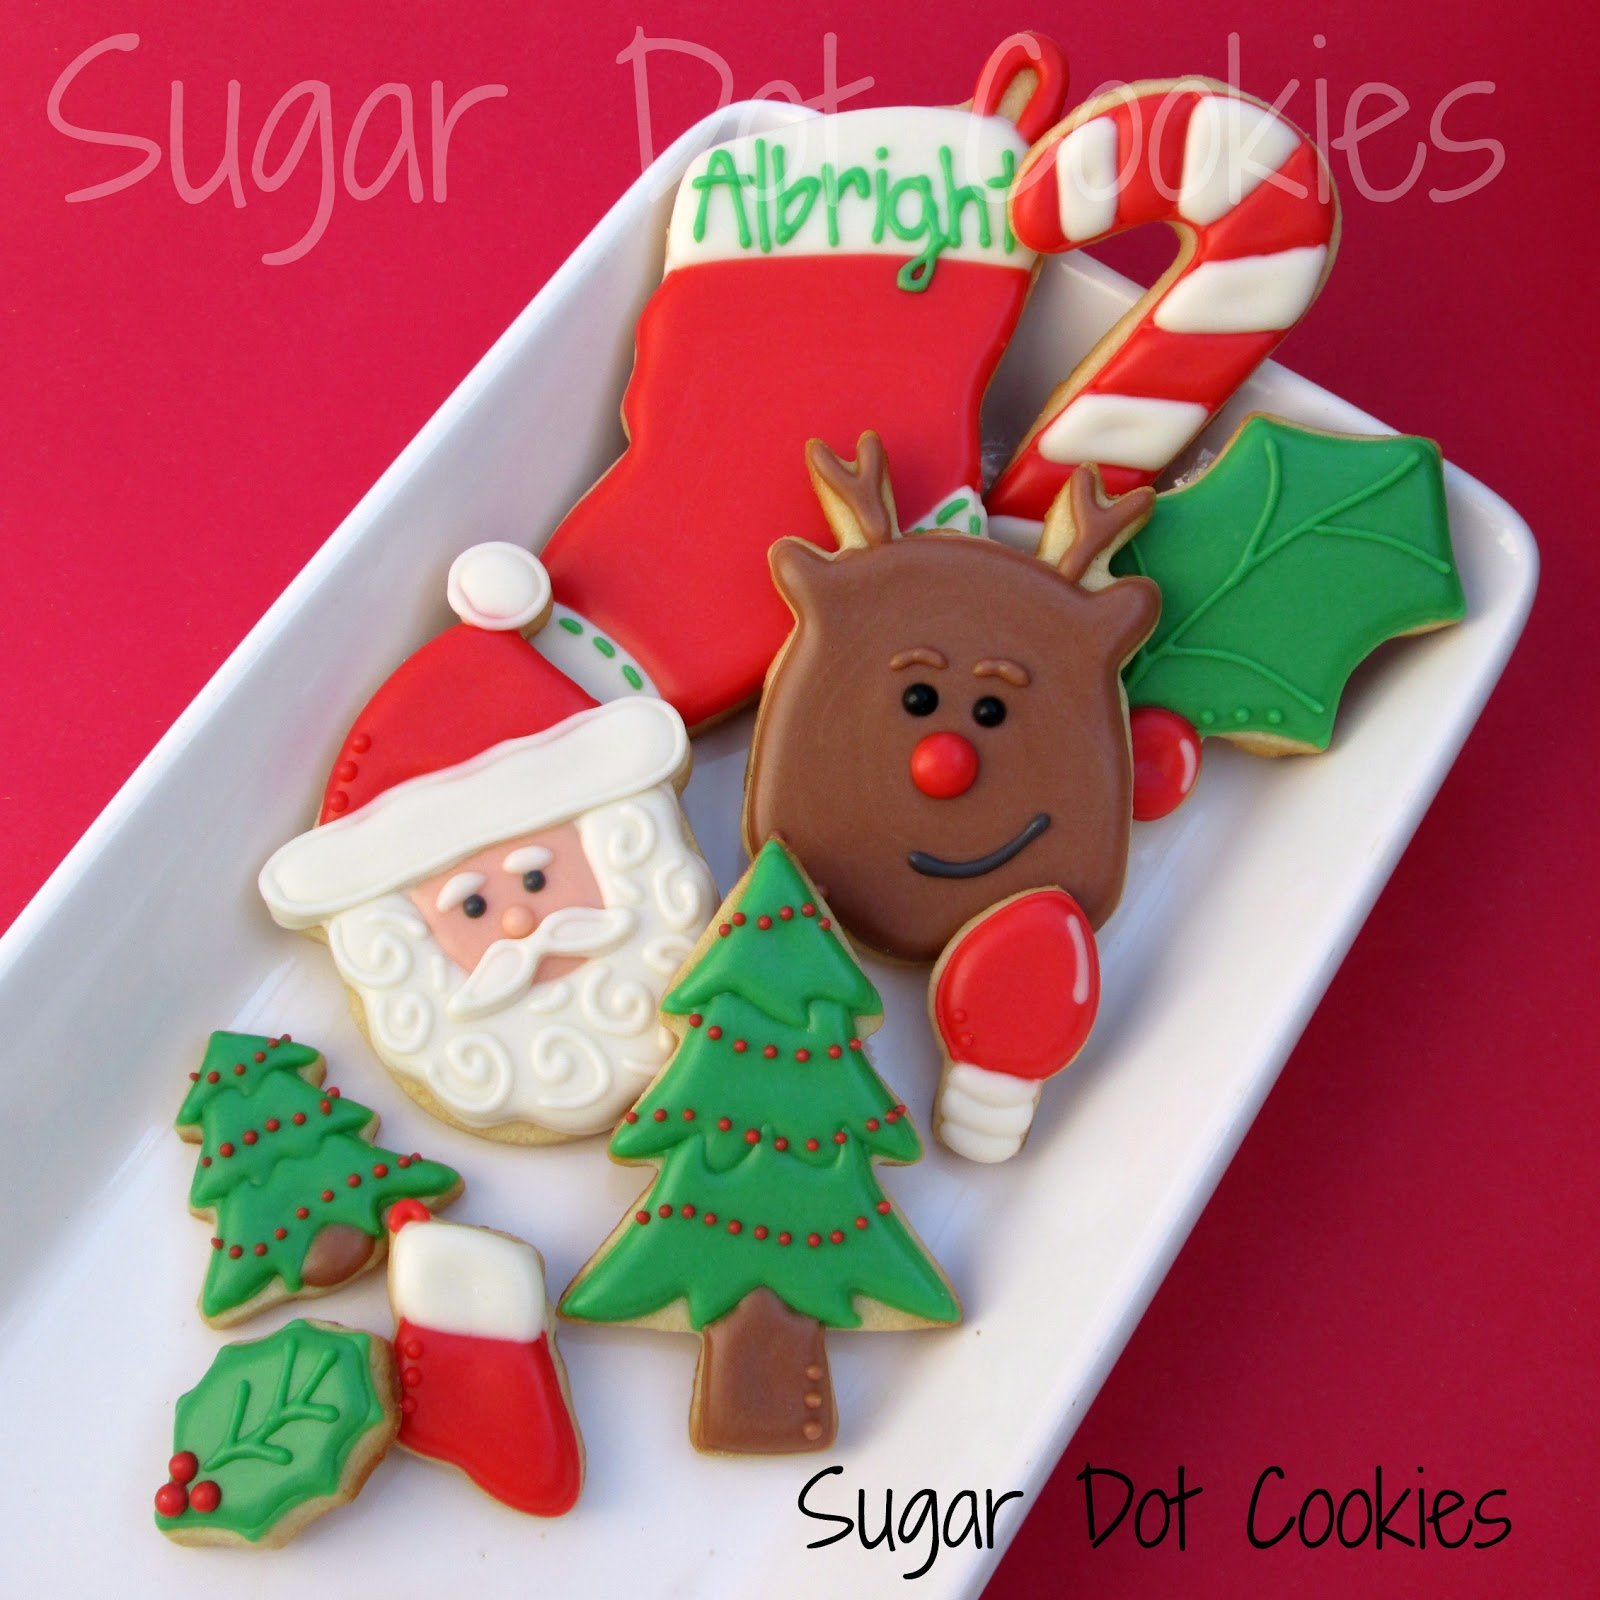 sugar fairy sweet Christmas Sugar Cookies with Royal Icing 2012